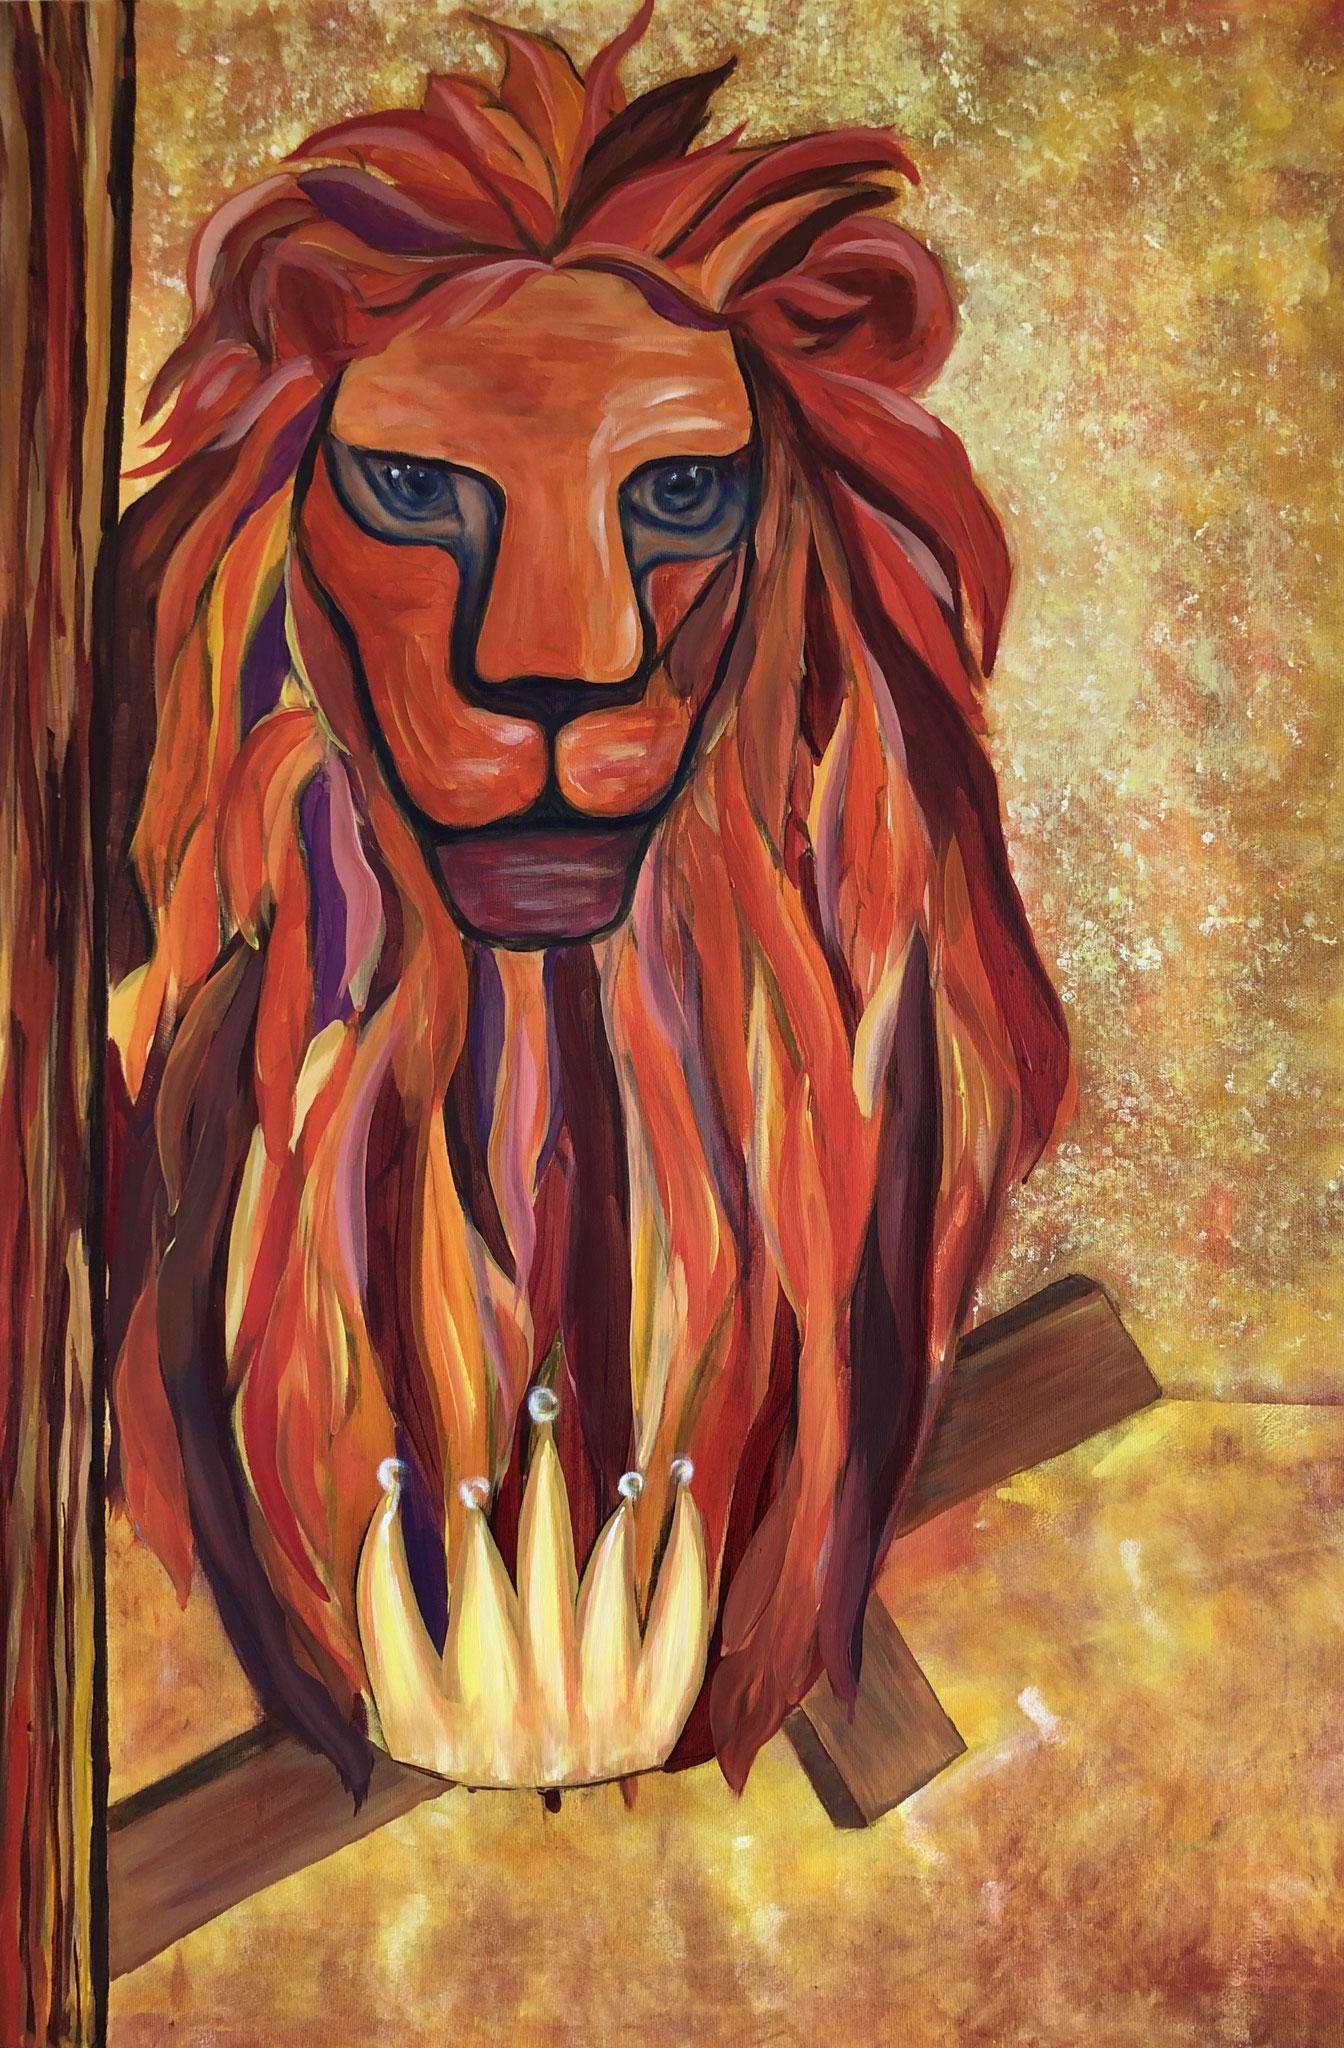 Matthäus, 100 x 80 cm, Acryl auf Leinwand